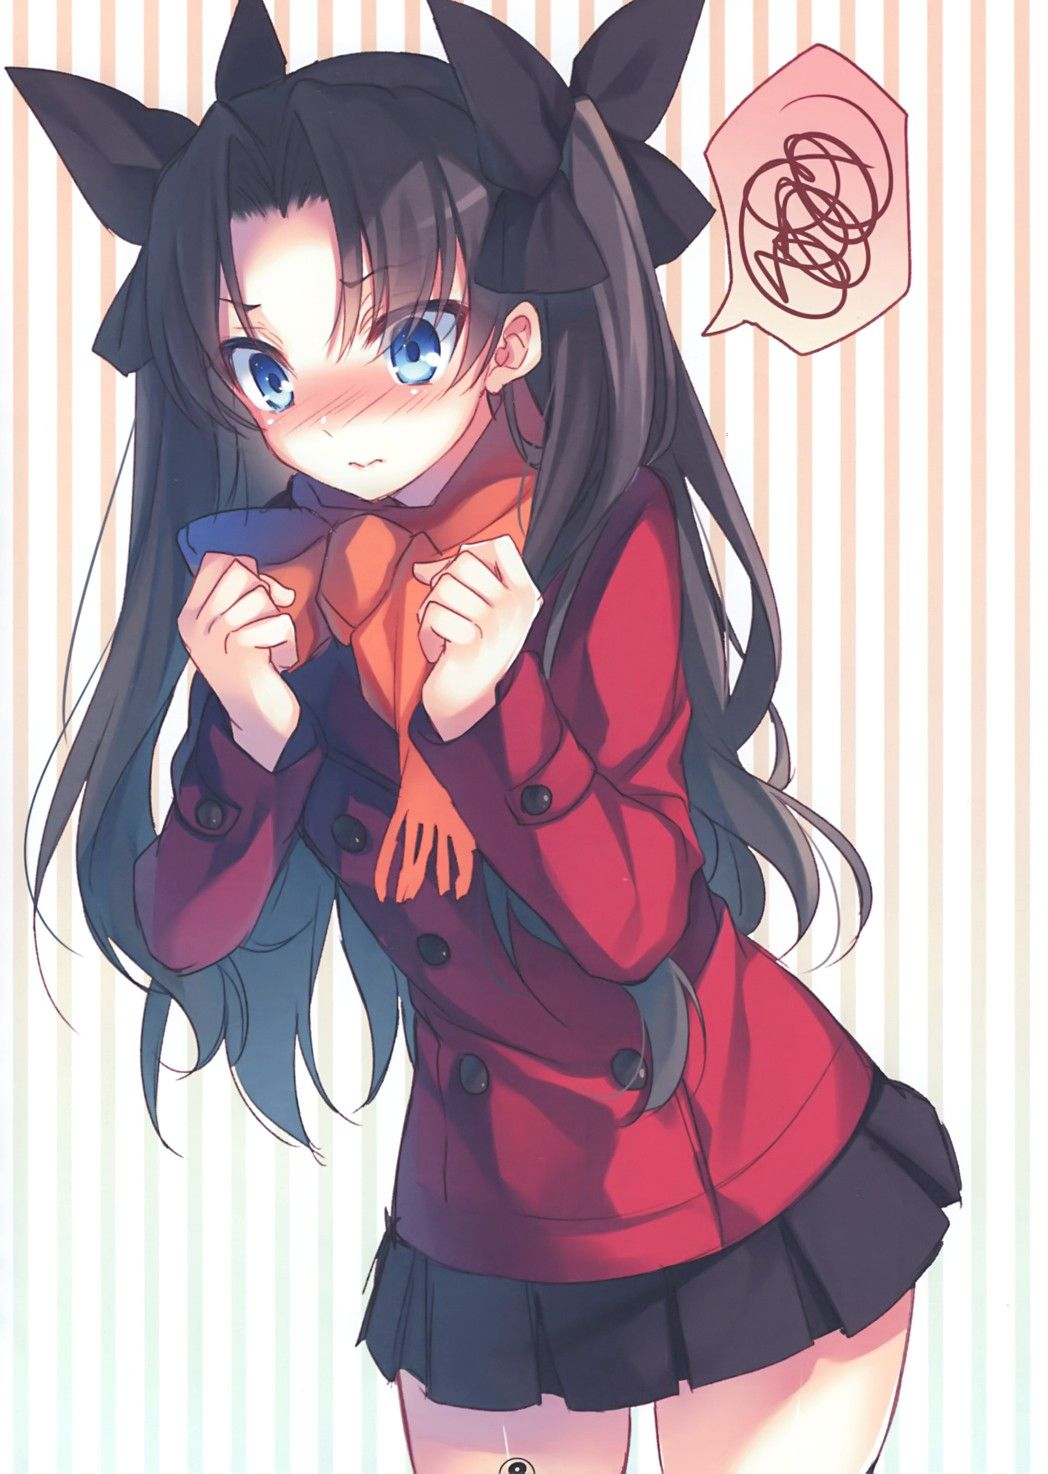 Pin By Anime Cati On Raznoe Fate Stay Night Anime Tohsaka Rin Tsundere